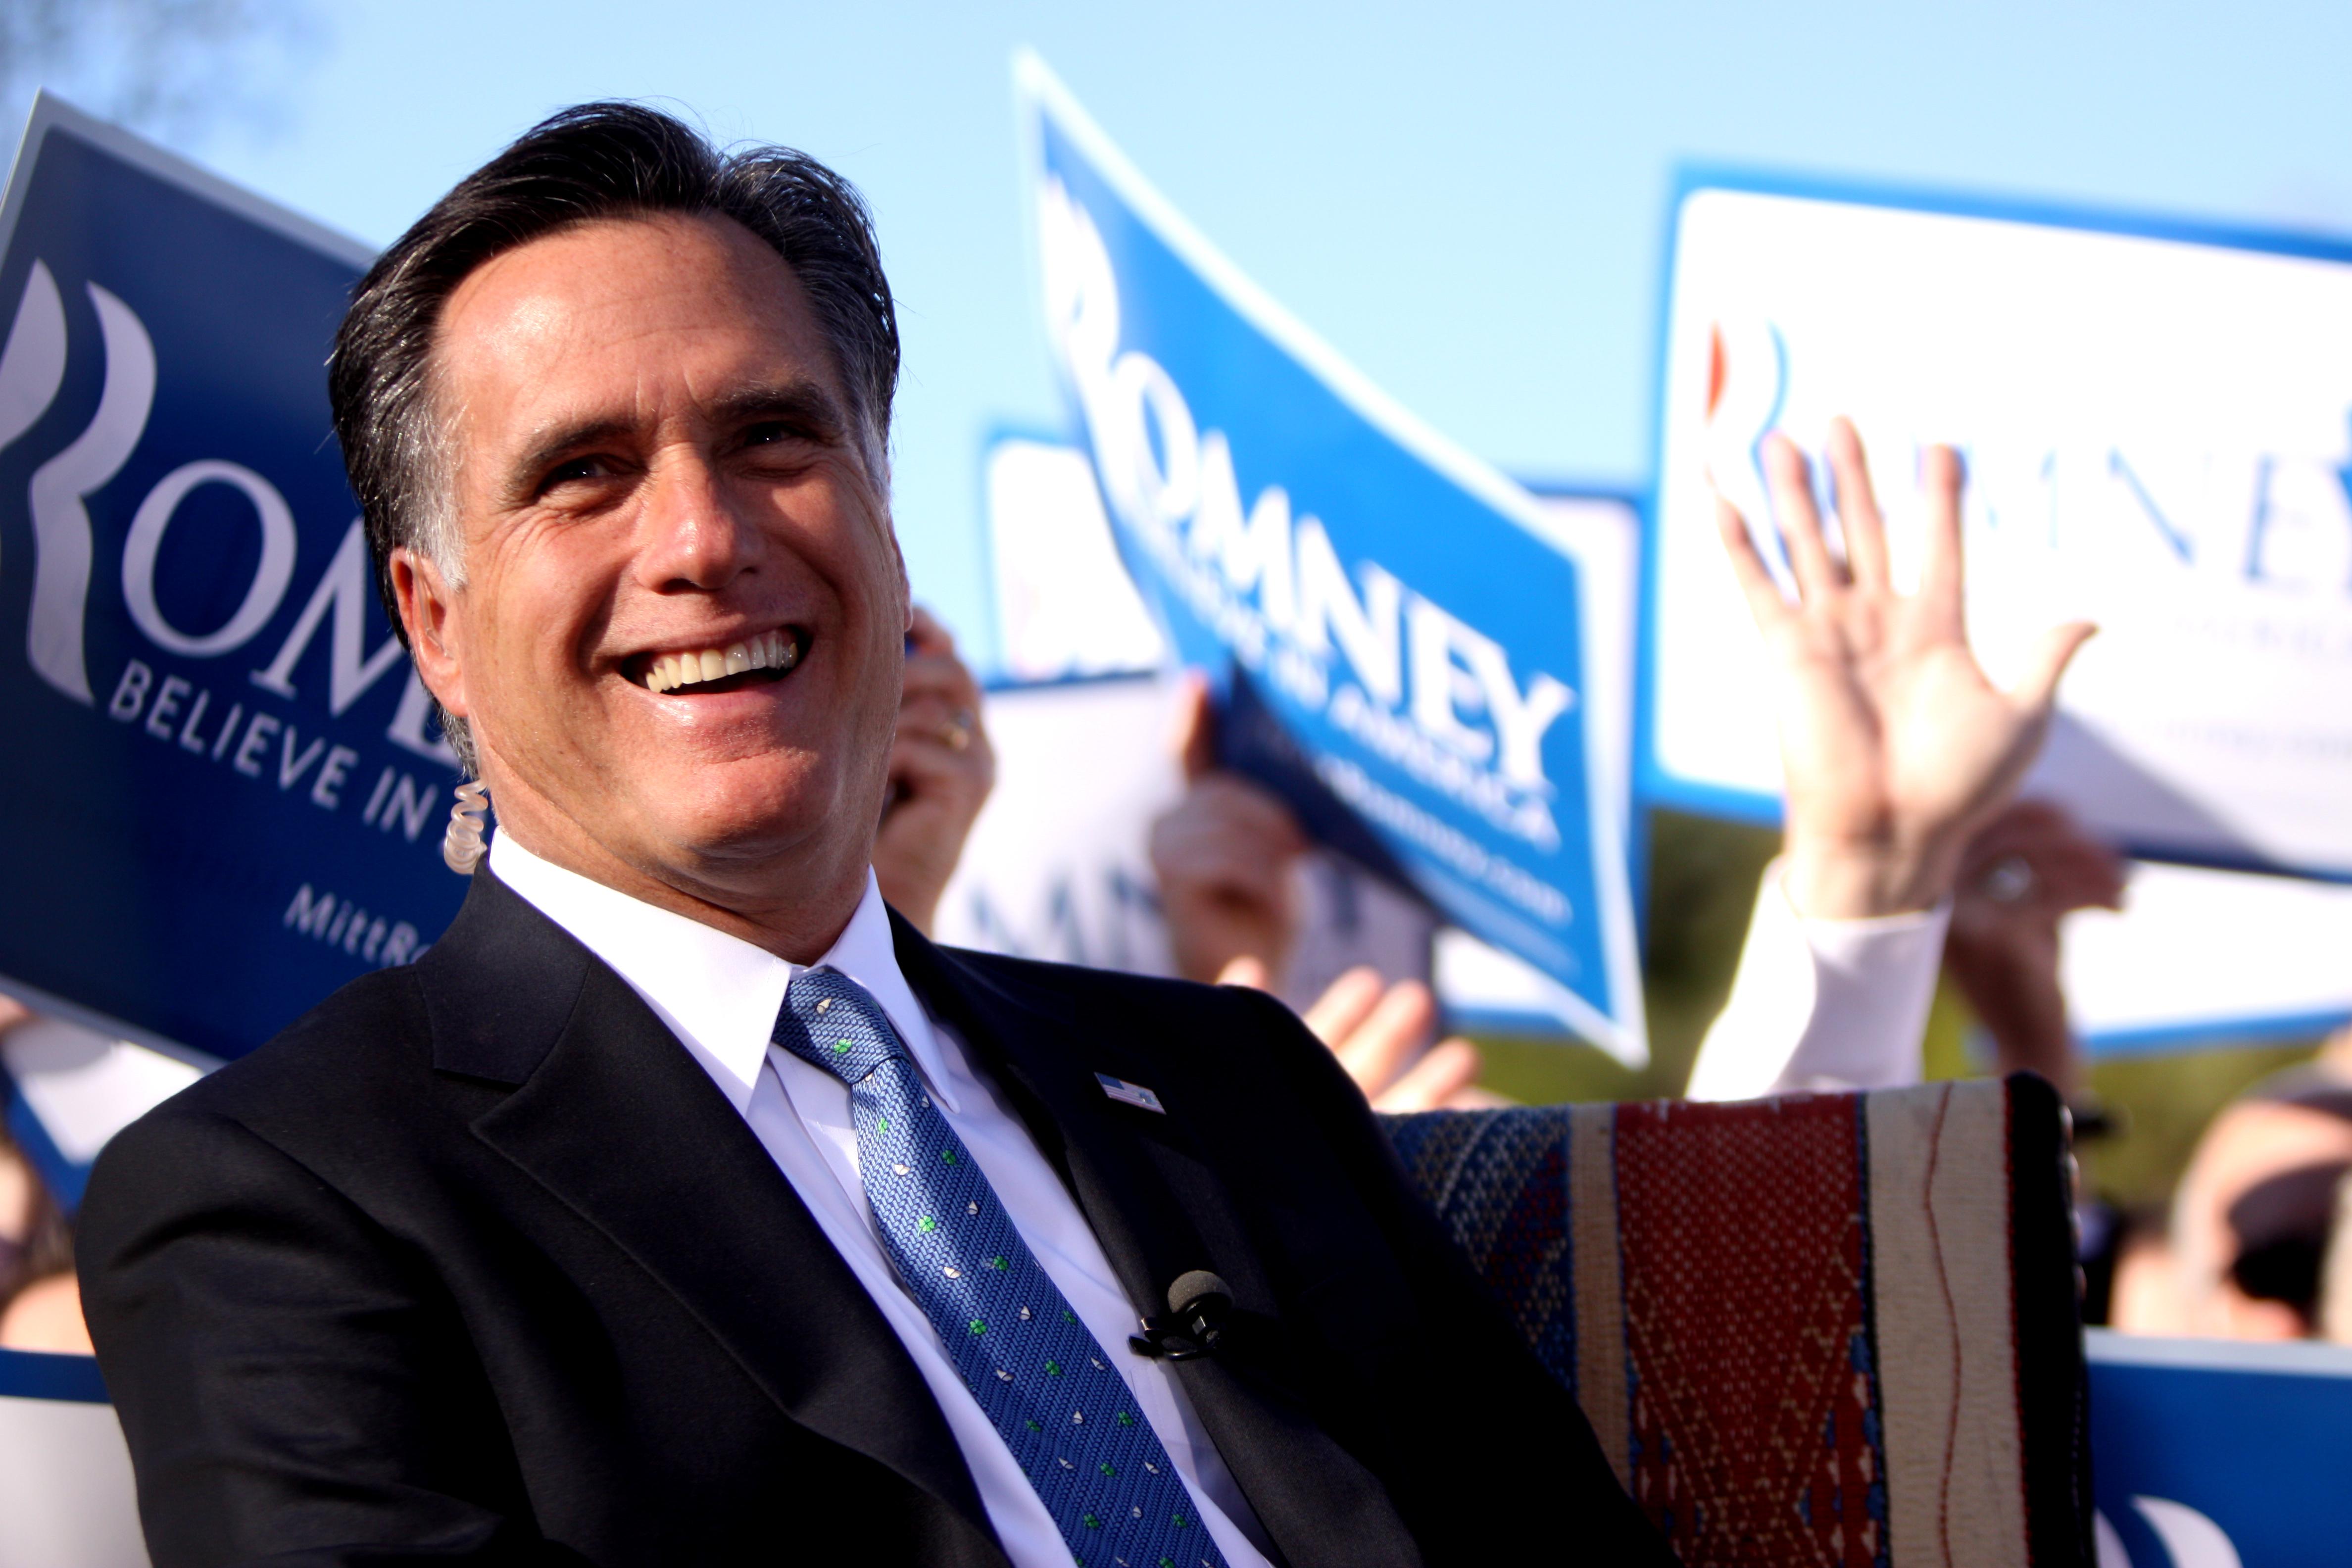 Mitt Romney (Credit: Wikipedia/Gage Skidmore)